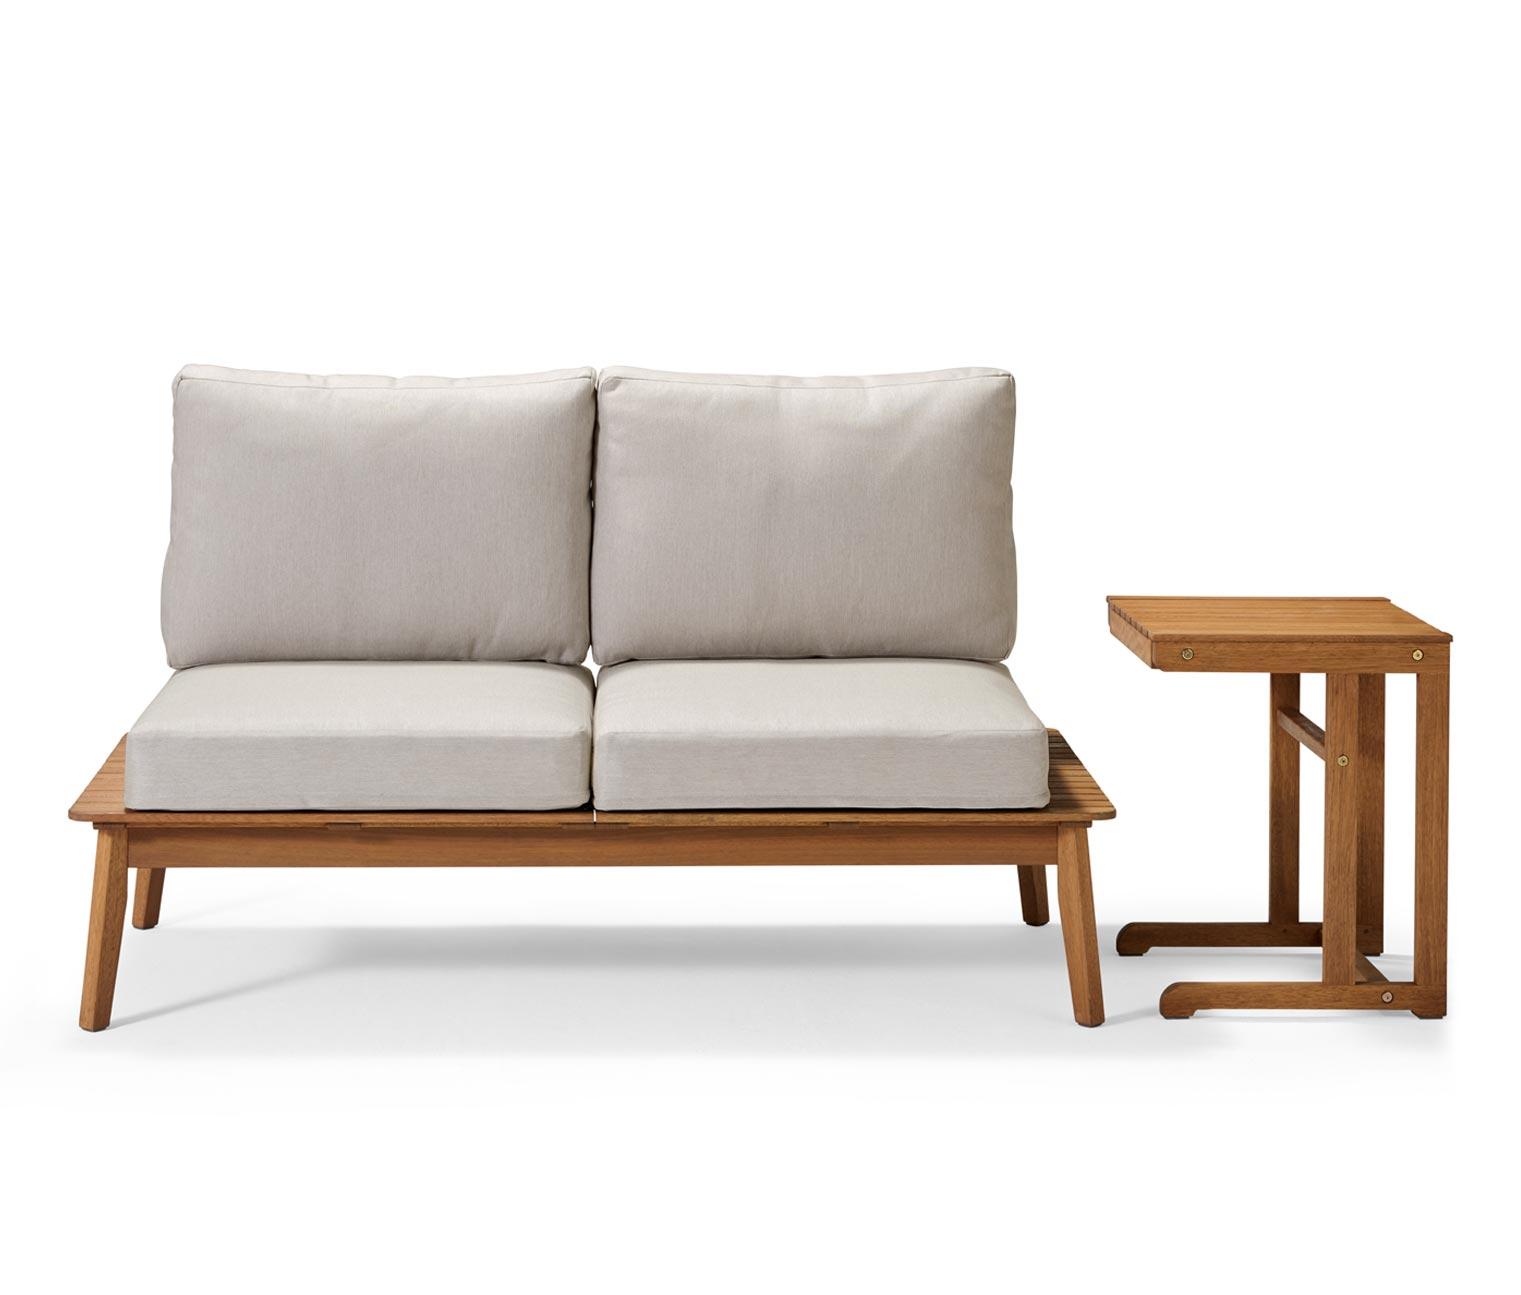 Full Size of Gartensofa Tchibo Komfort 2 In 1 Garten Sofa Stunning With Wohnzimmer Gartensofa Tchibo